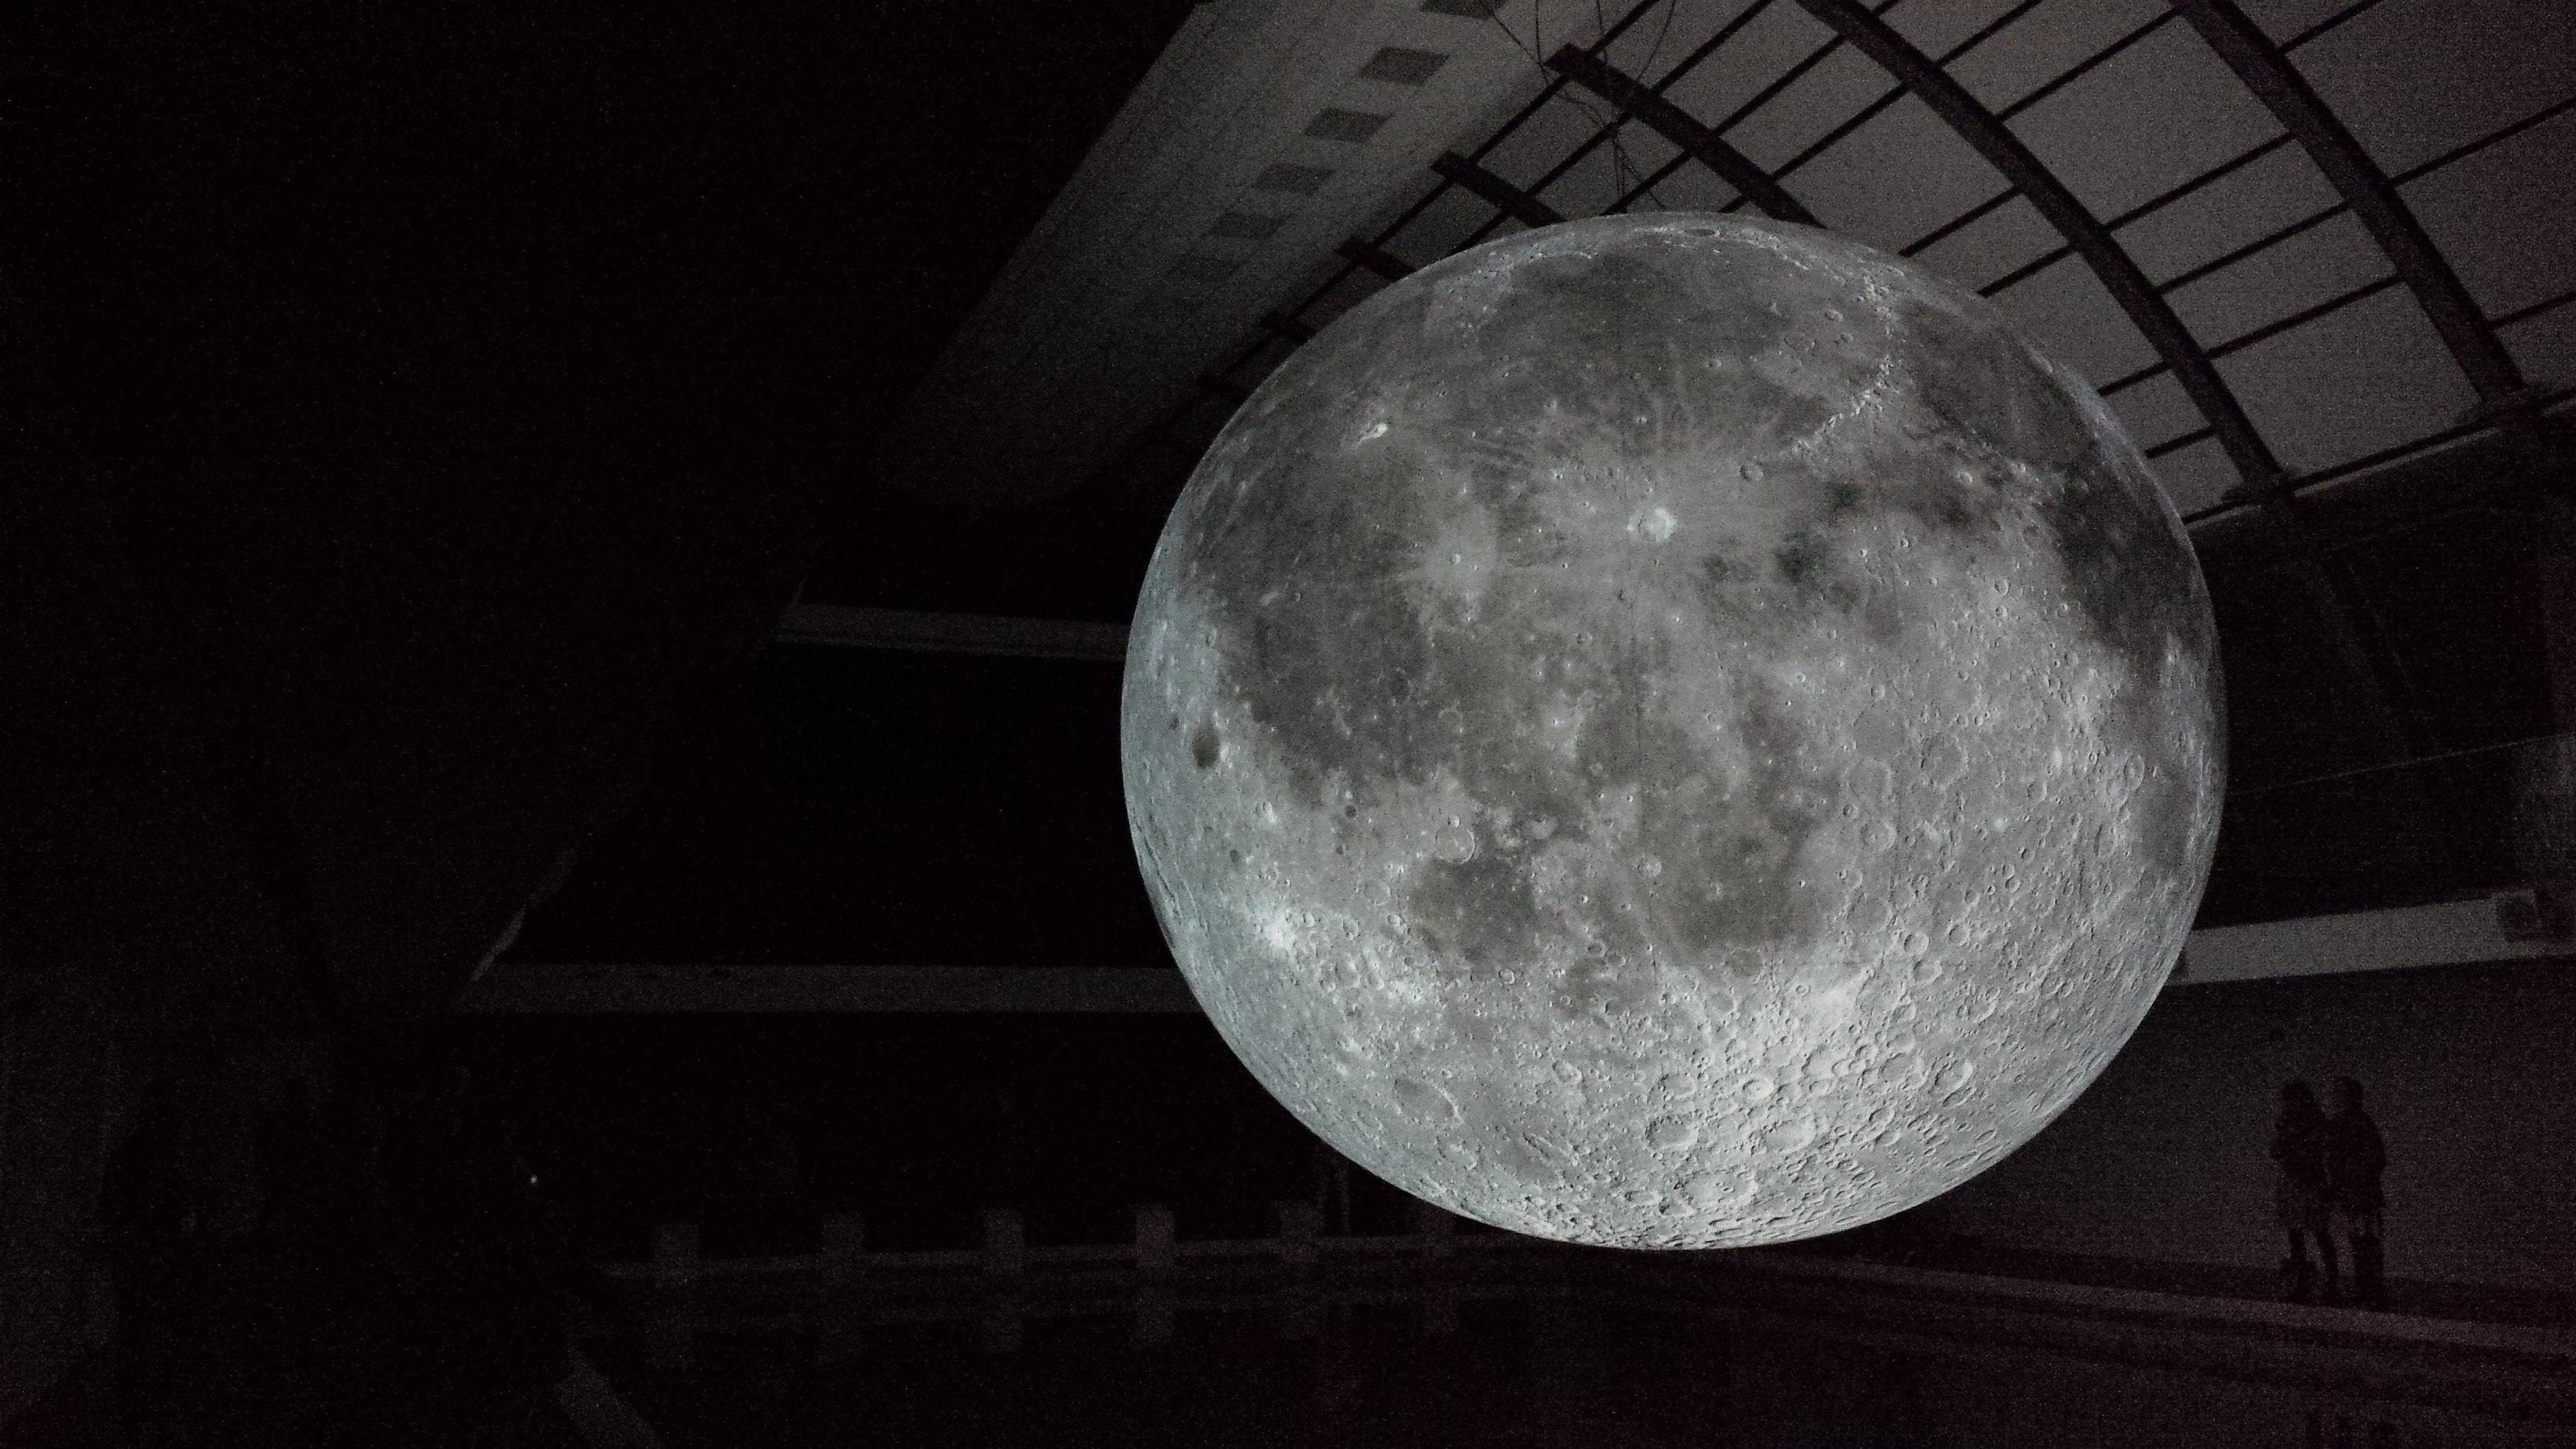 Full Moon Photo, Abstract, Moon, Sphere, Shadow, HQ Photo